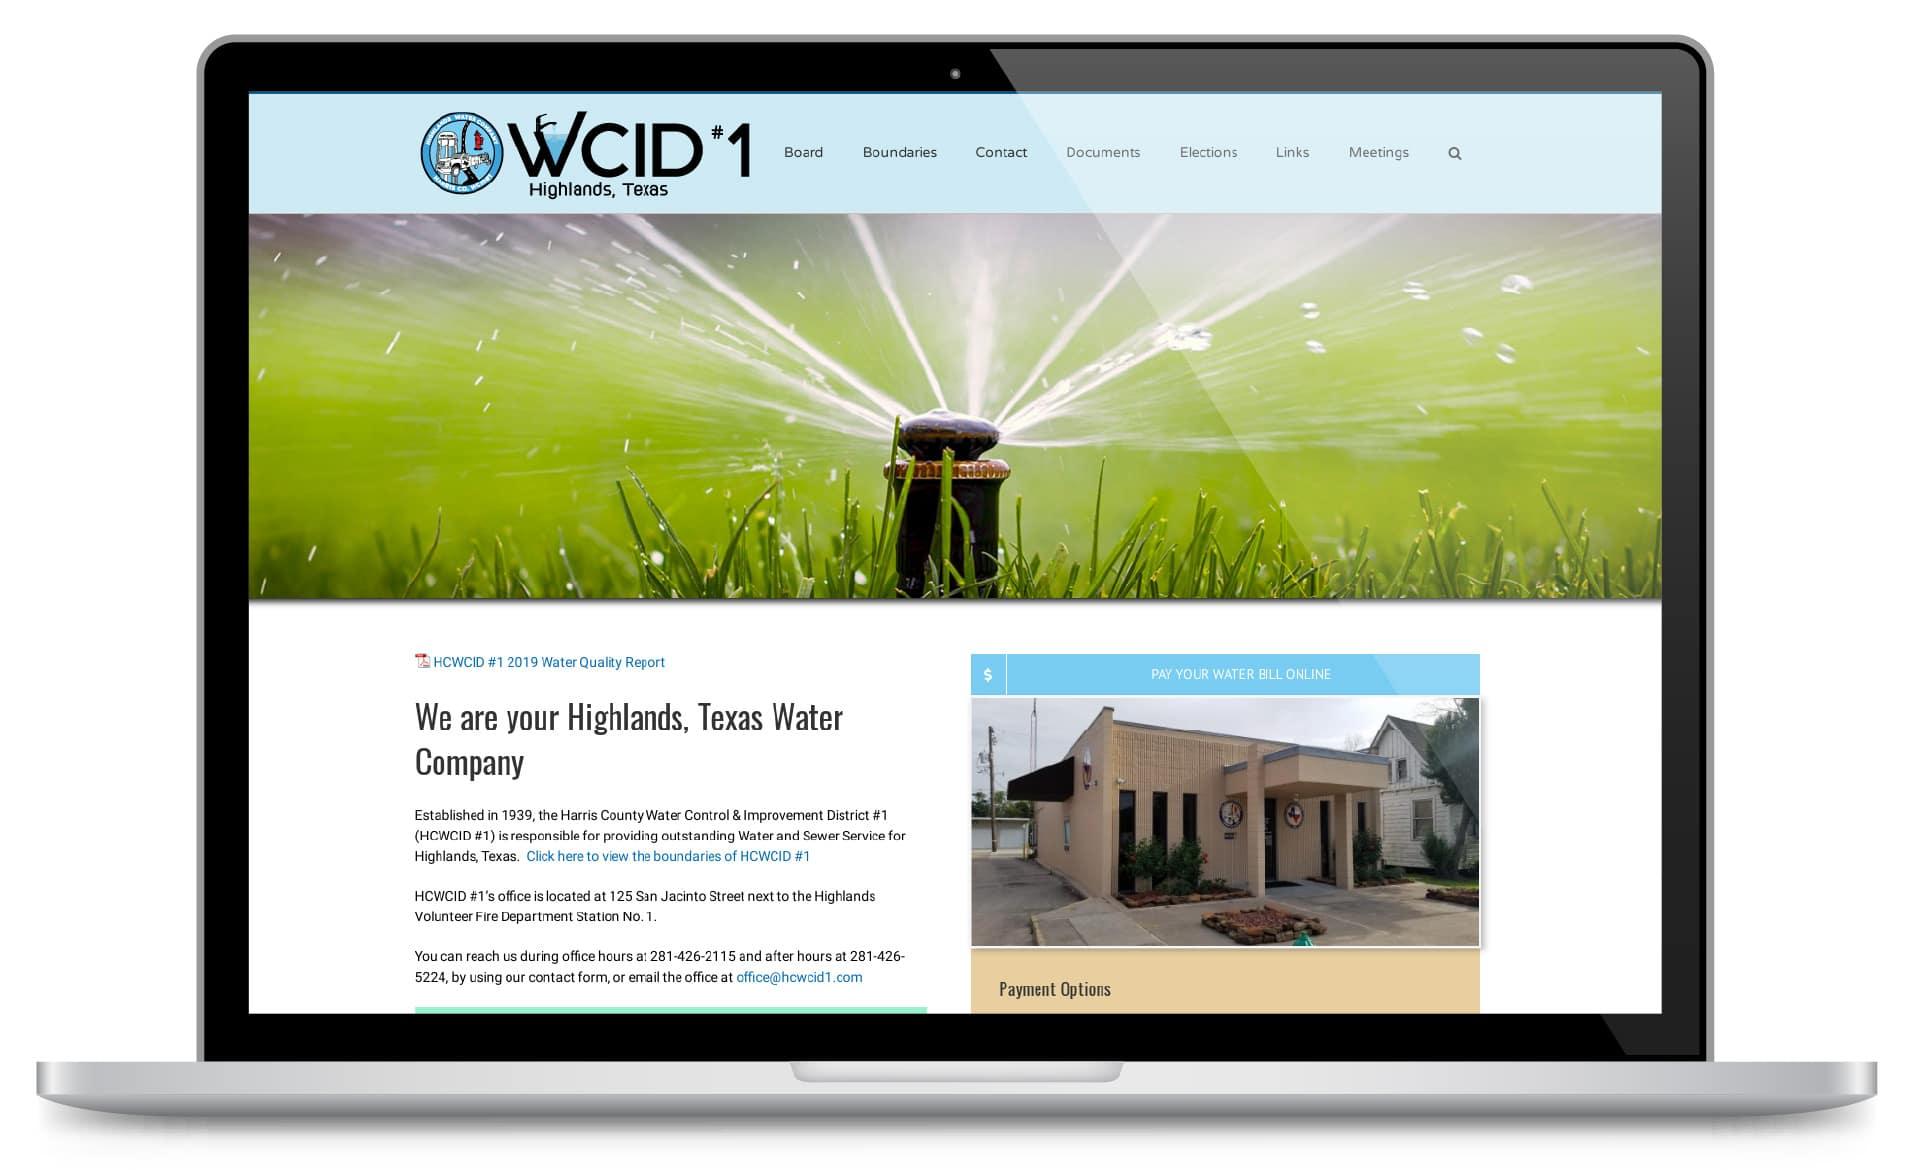 HCWCID 1 - Highlands, Texas